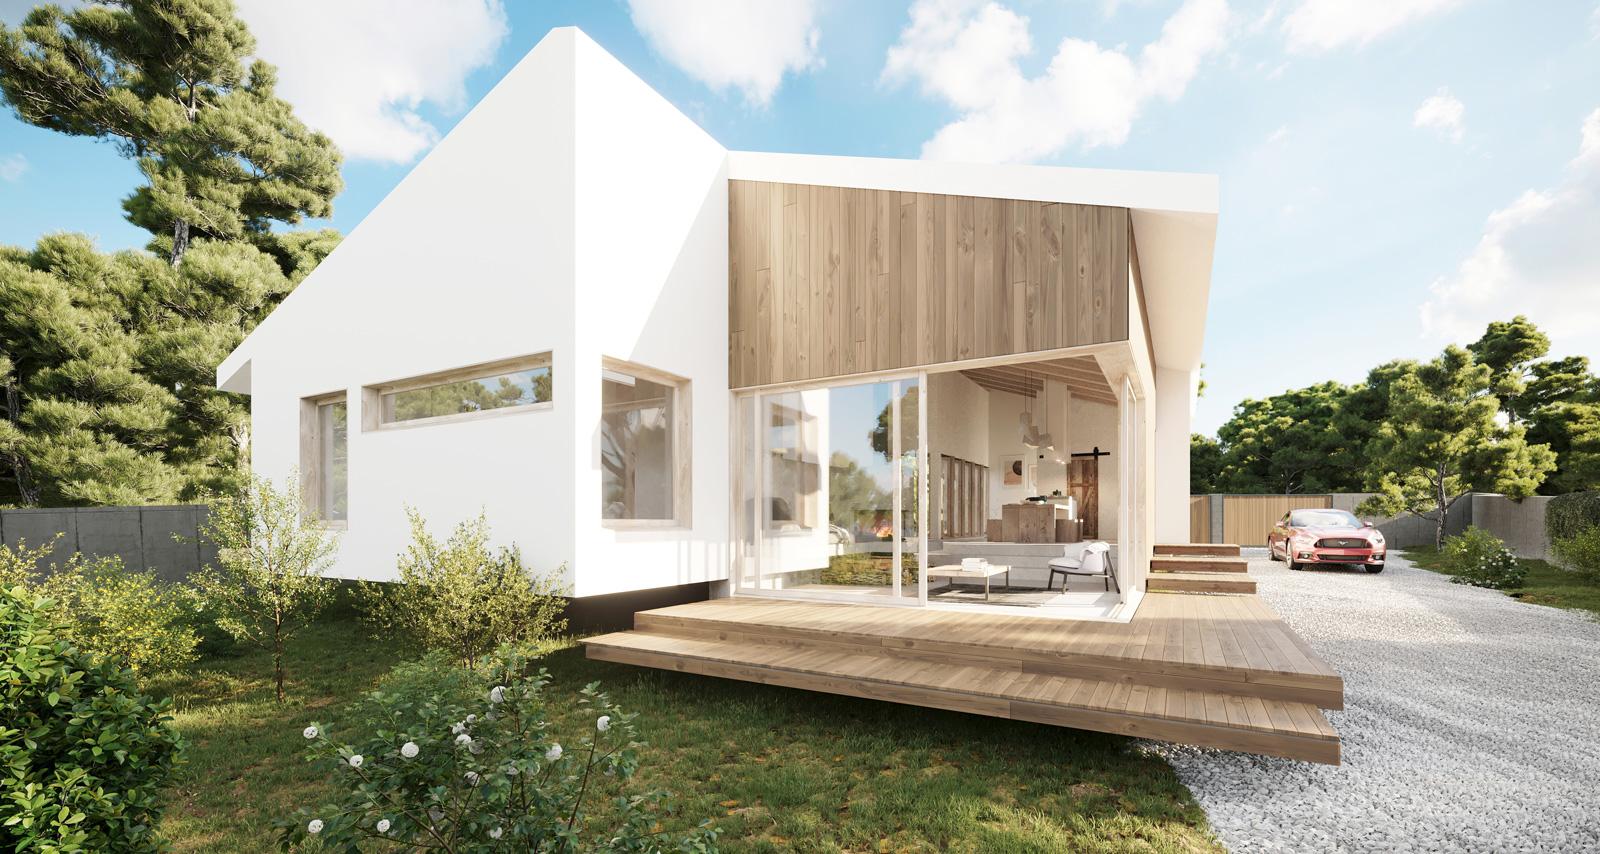 estudio de arquitectura en serín